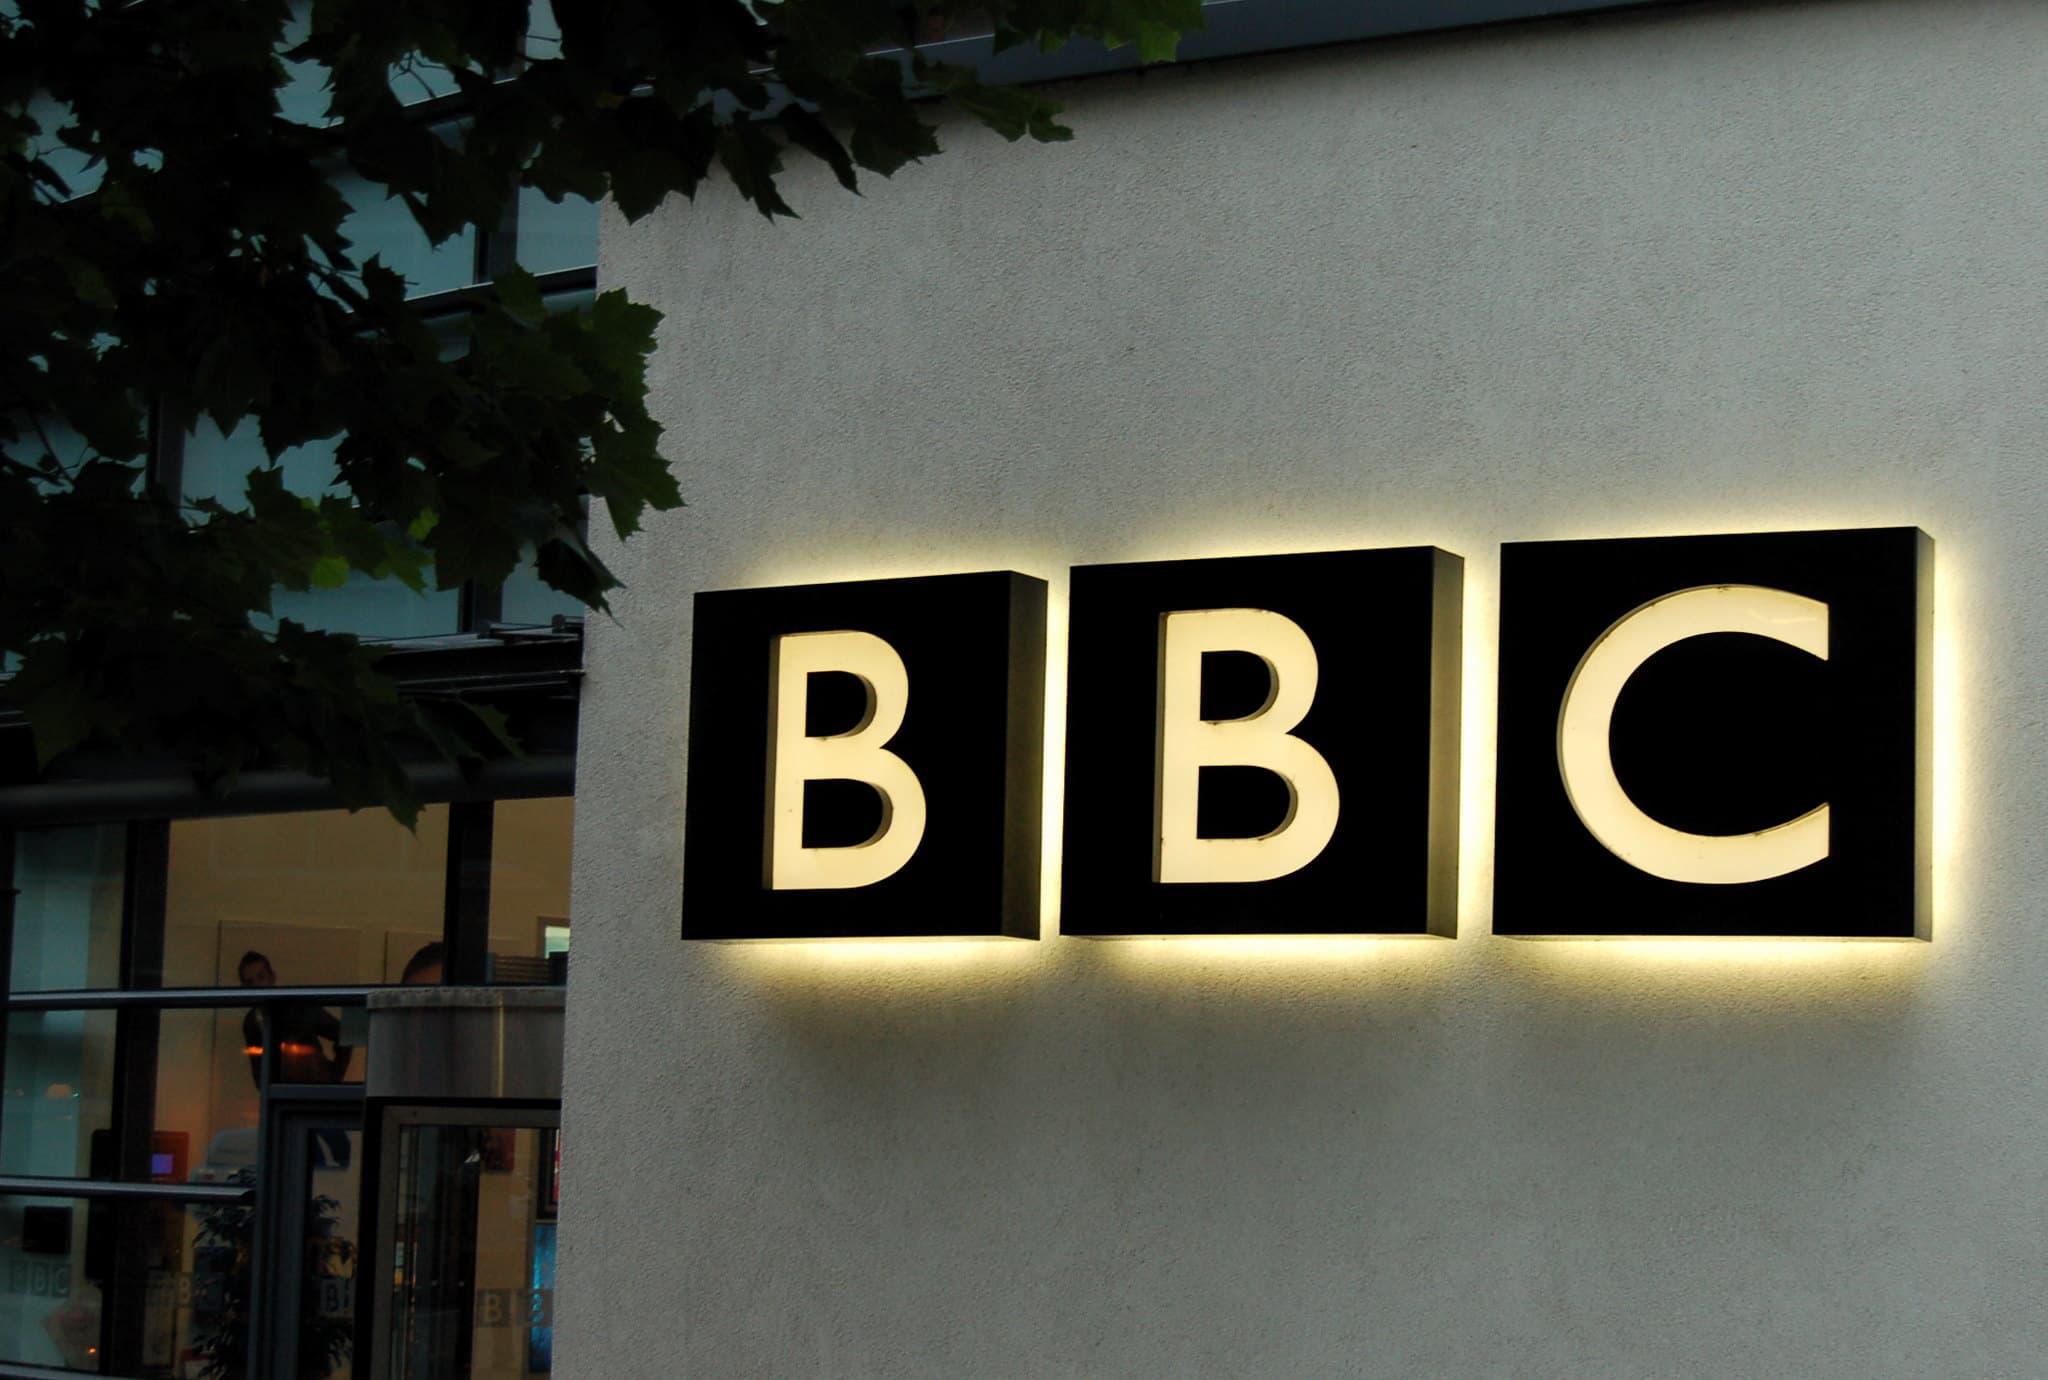 bbc, lgbtq, ban, pride, blm